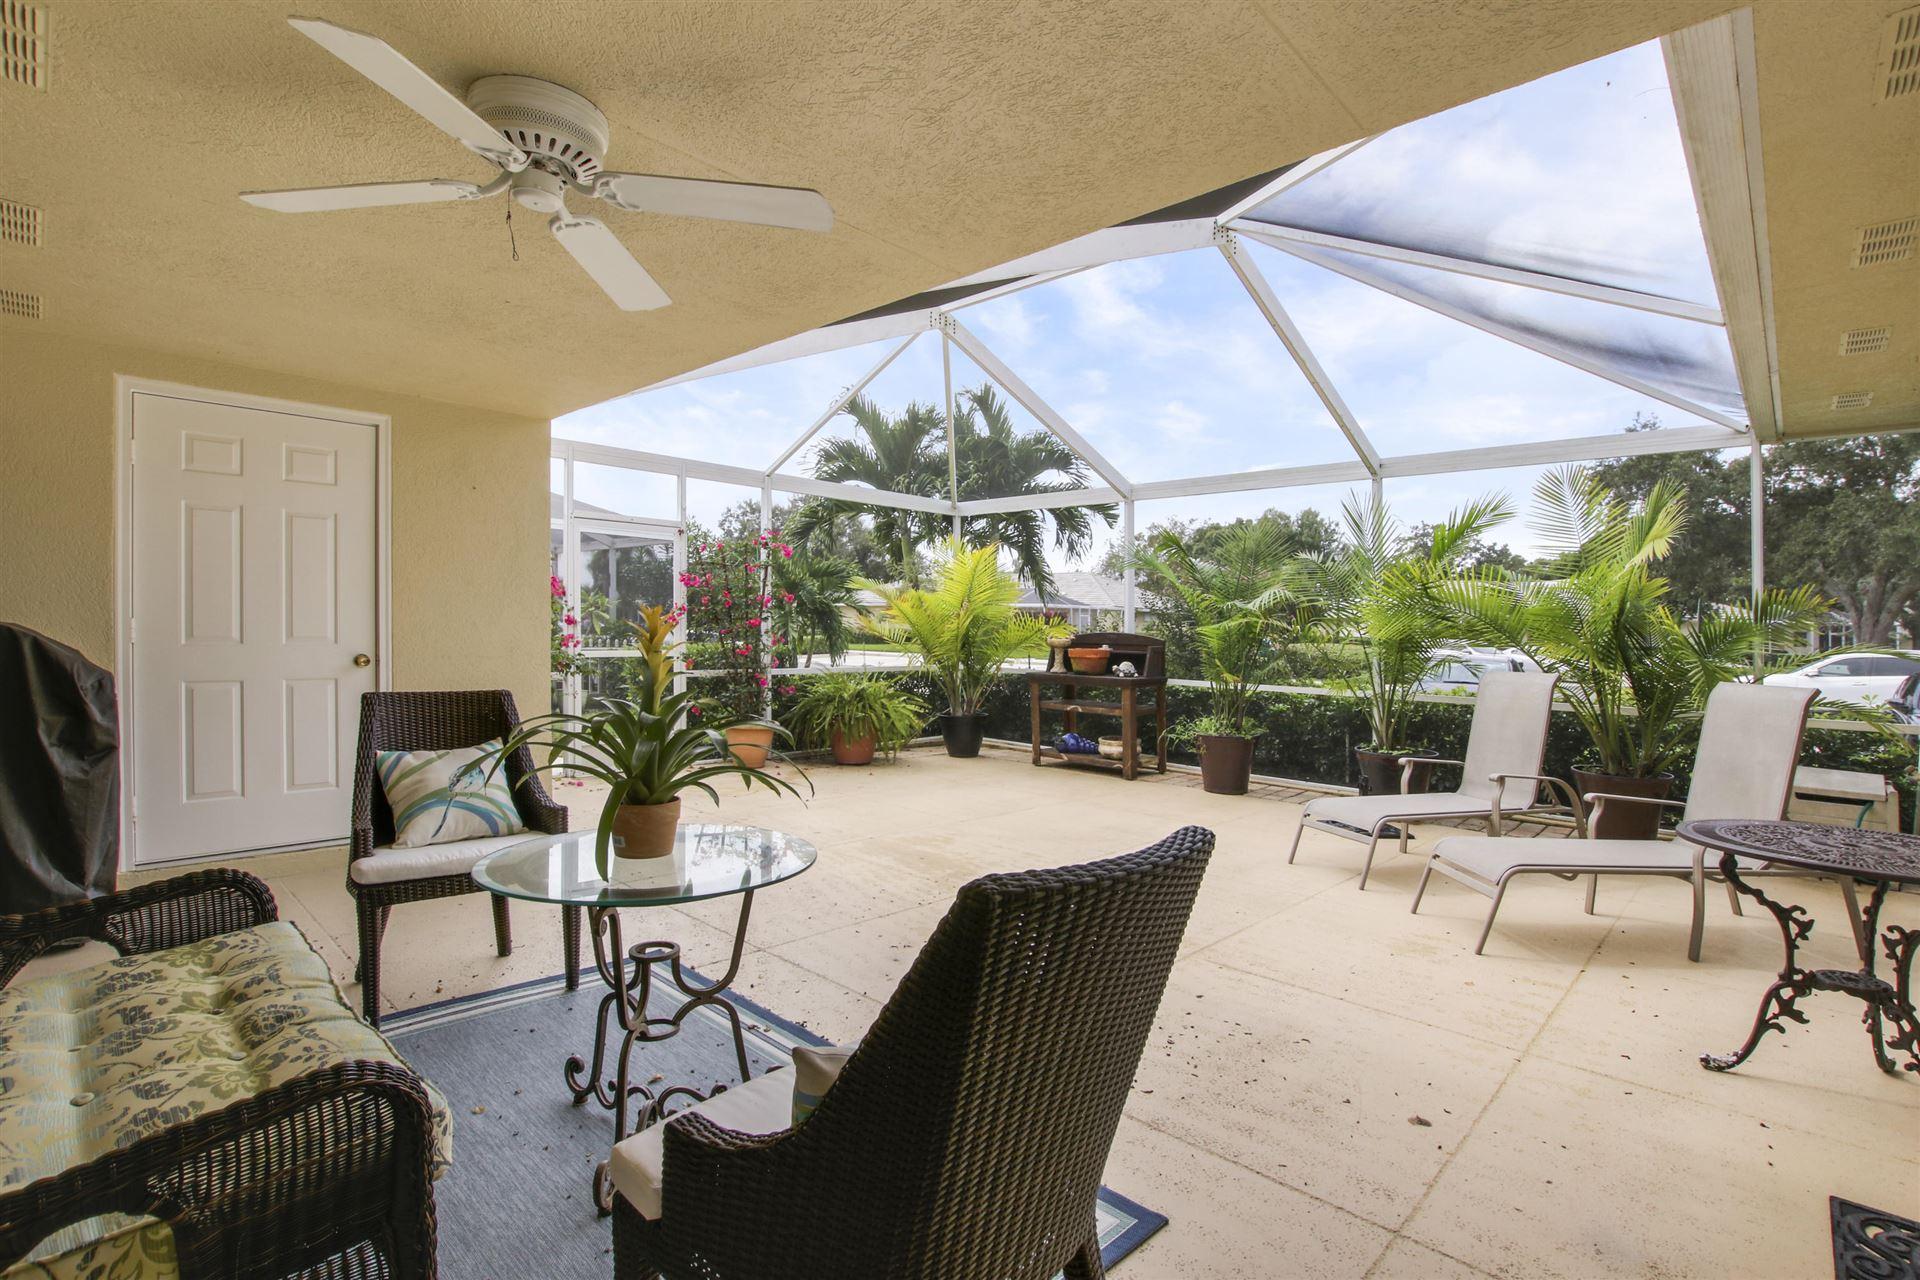 Photo of 1258 NW Sun Terrace Circle #20d, Port Saint Lucie, FL 34986 (MLS # RX-10677889)